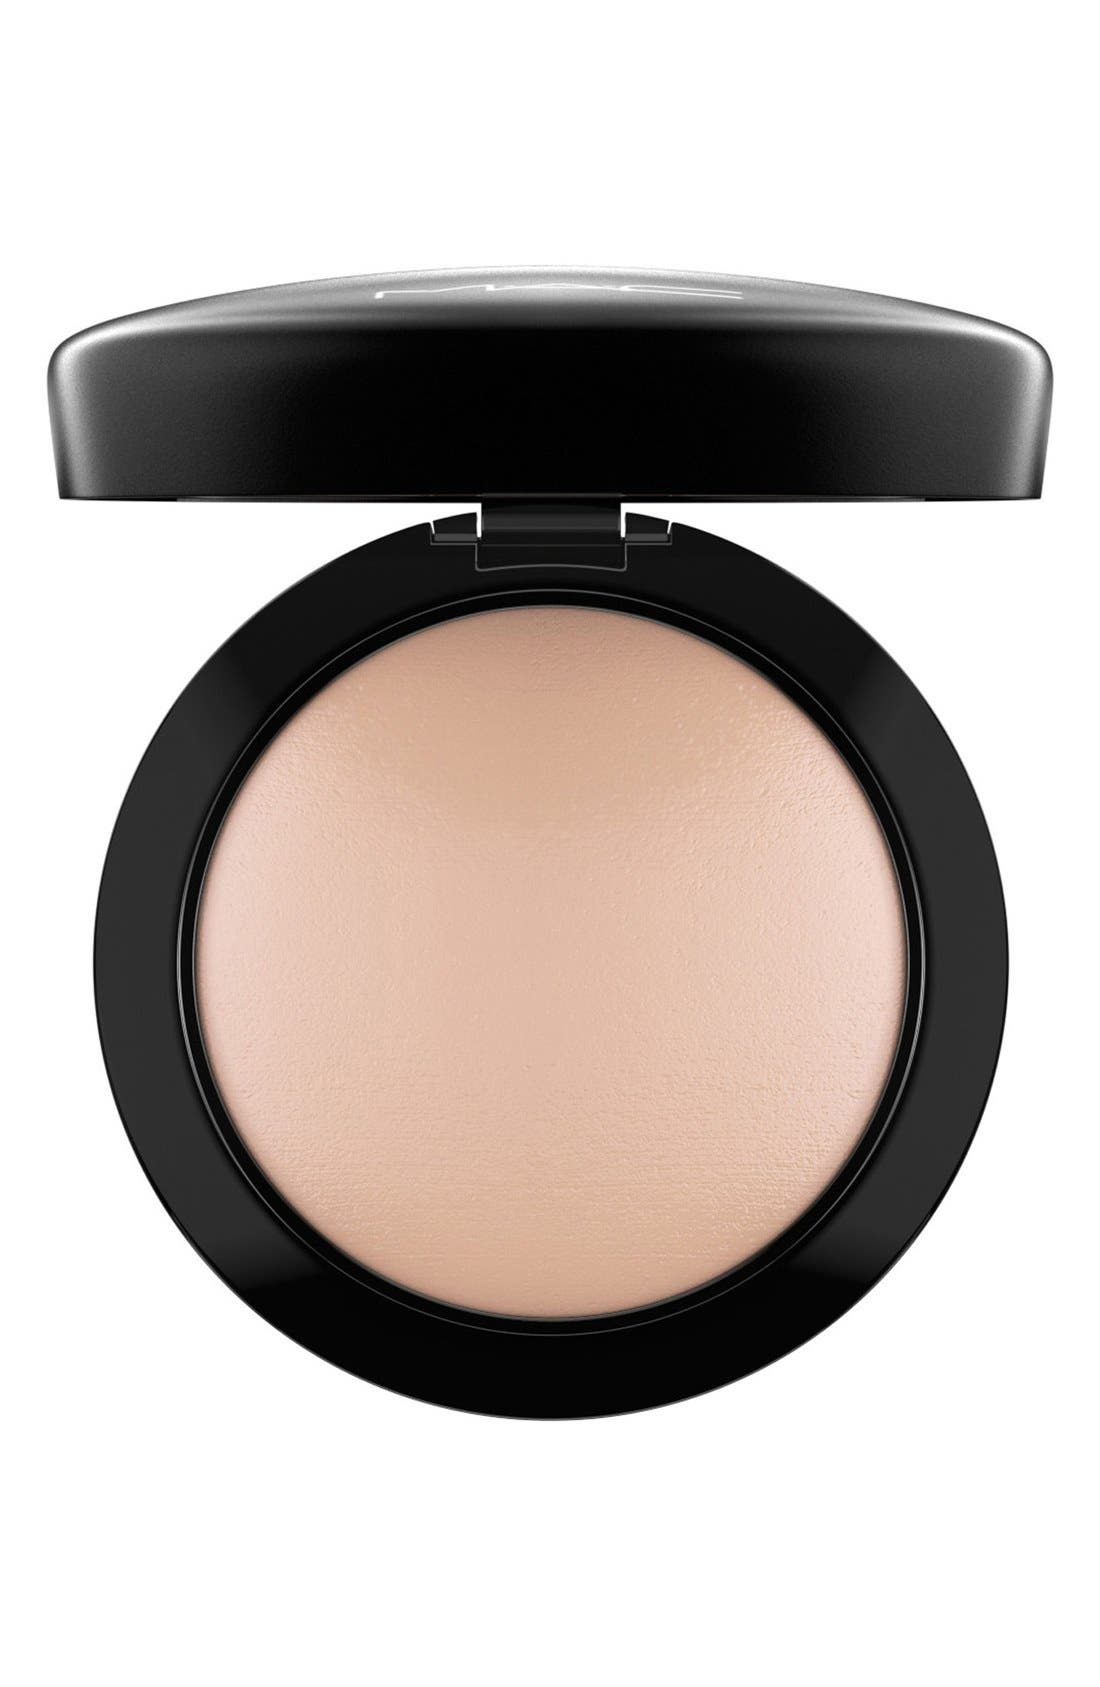 MAC Mineralize Skinfinish Natural Face Setting Powder